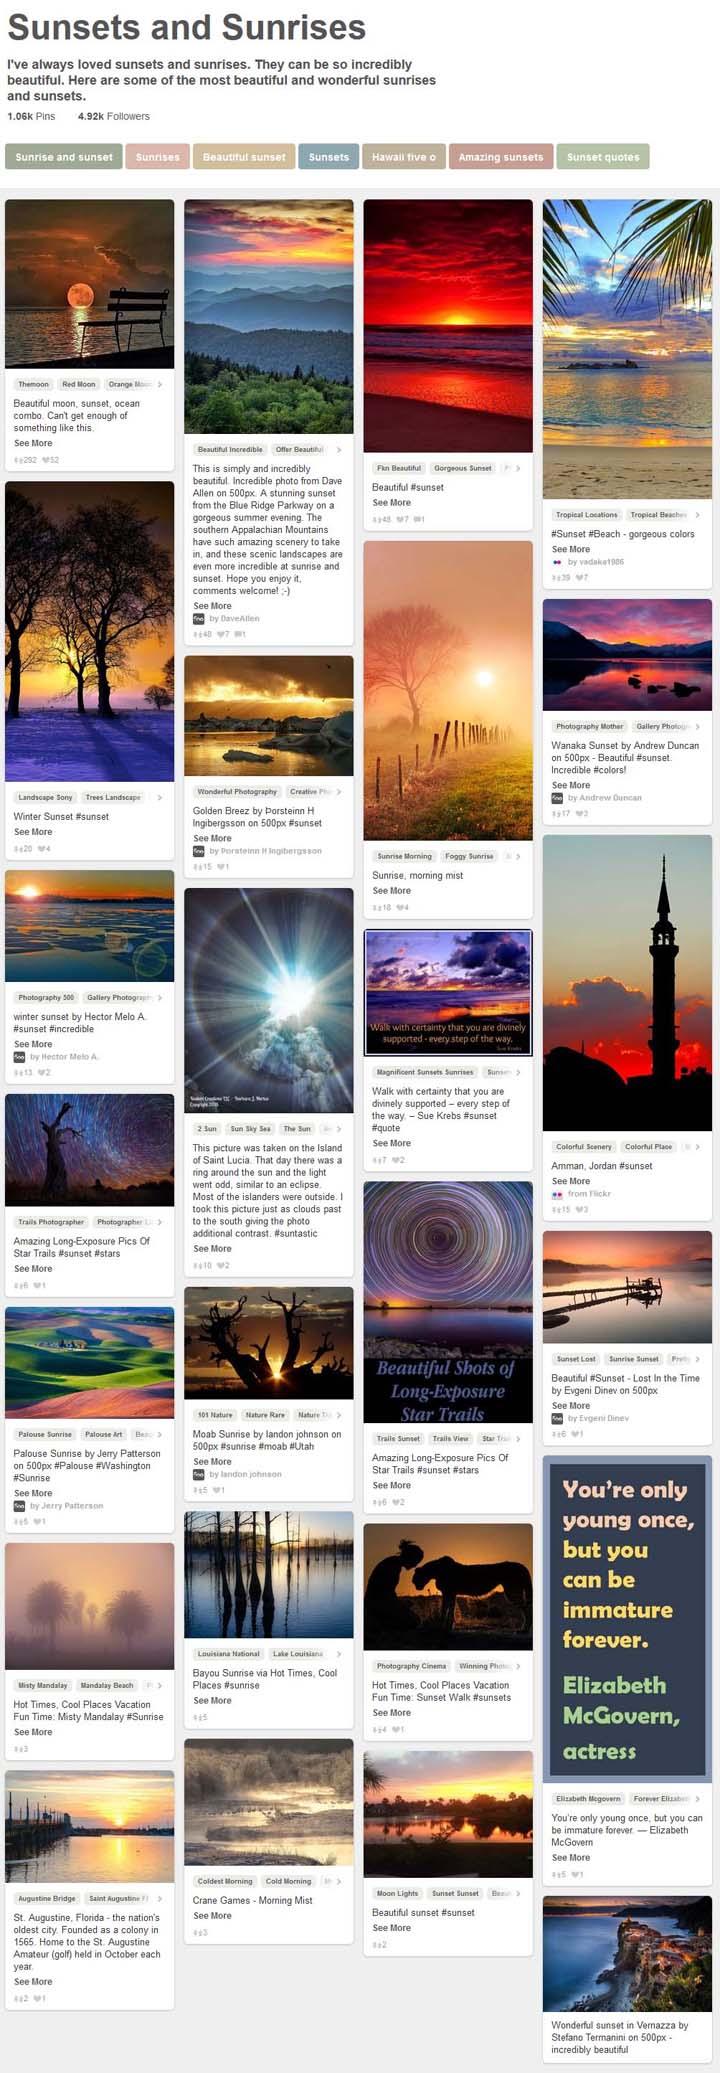 24 Sunsets